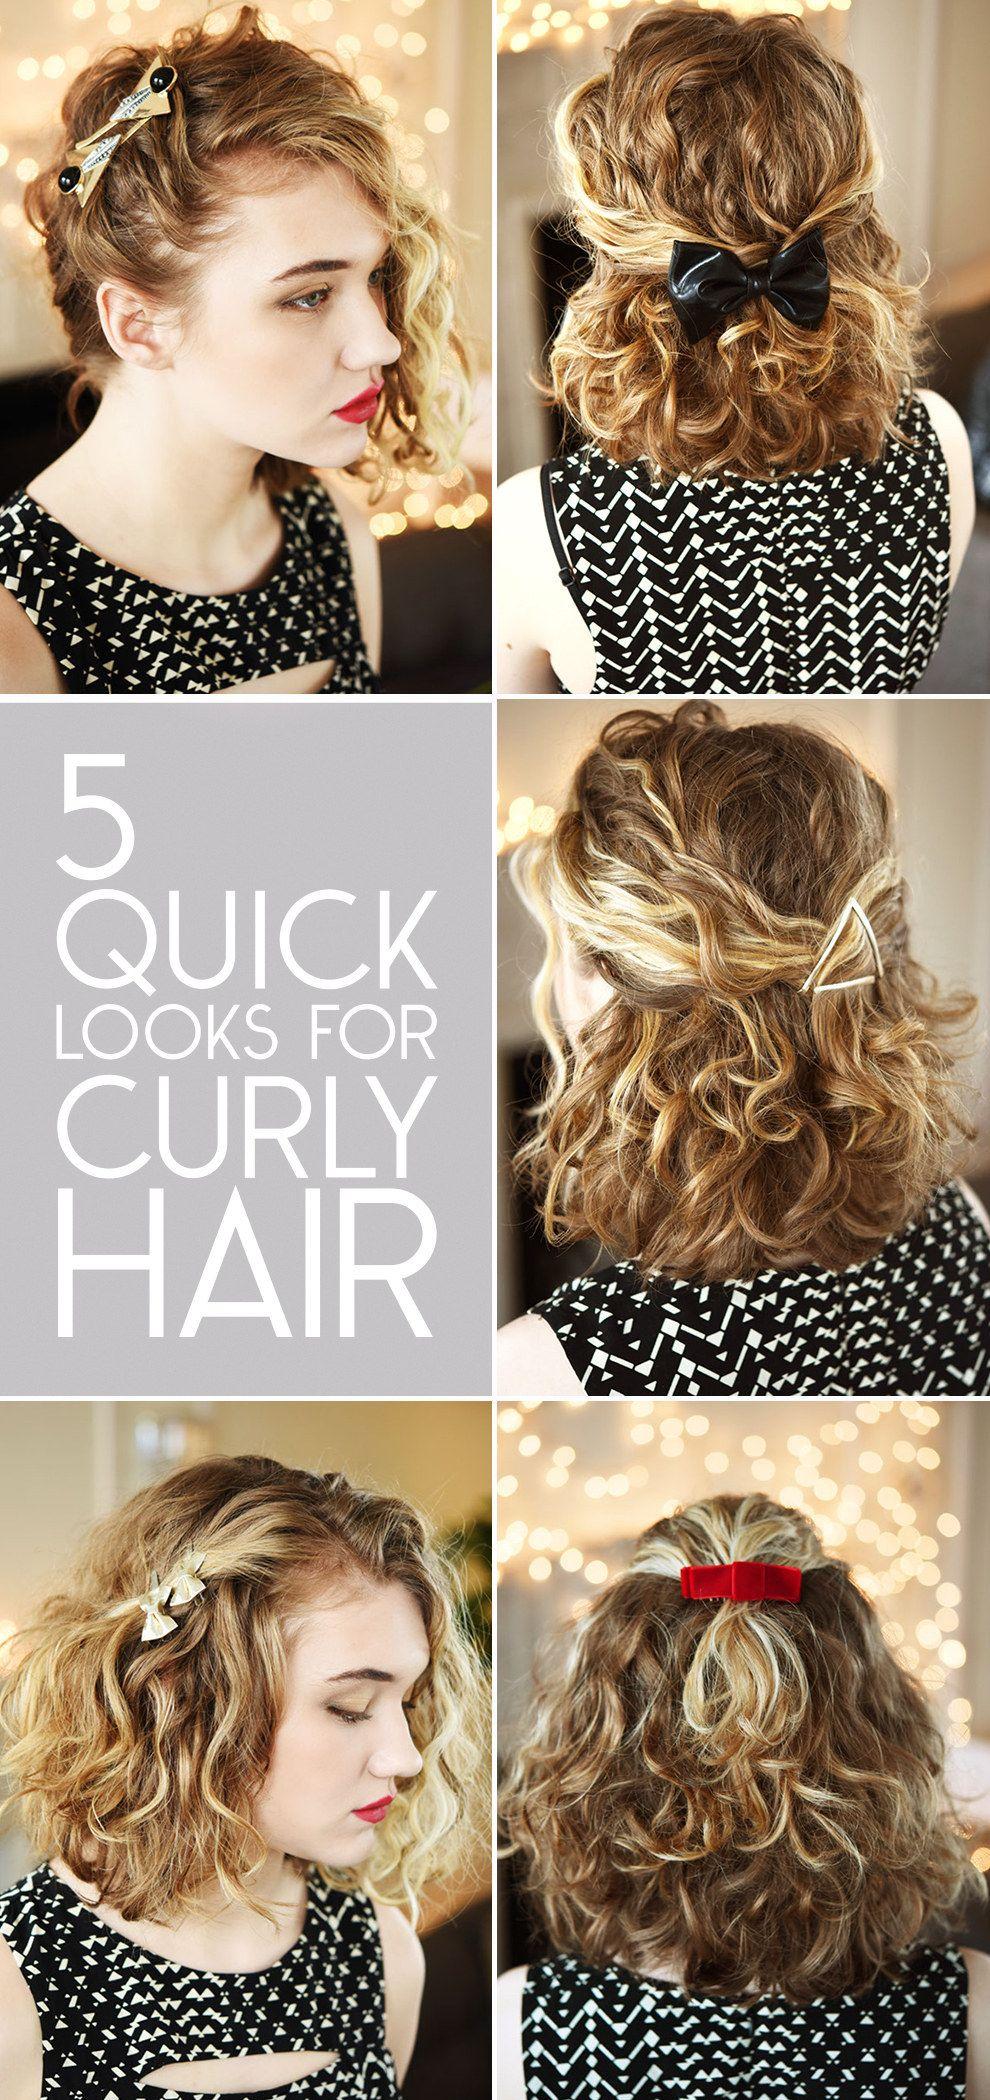 Styles for curly hair hair envy pinterest curly hair styles